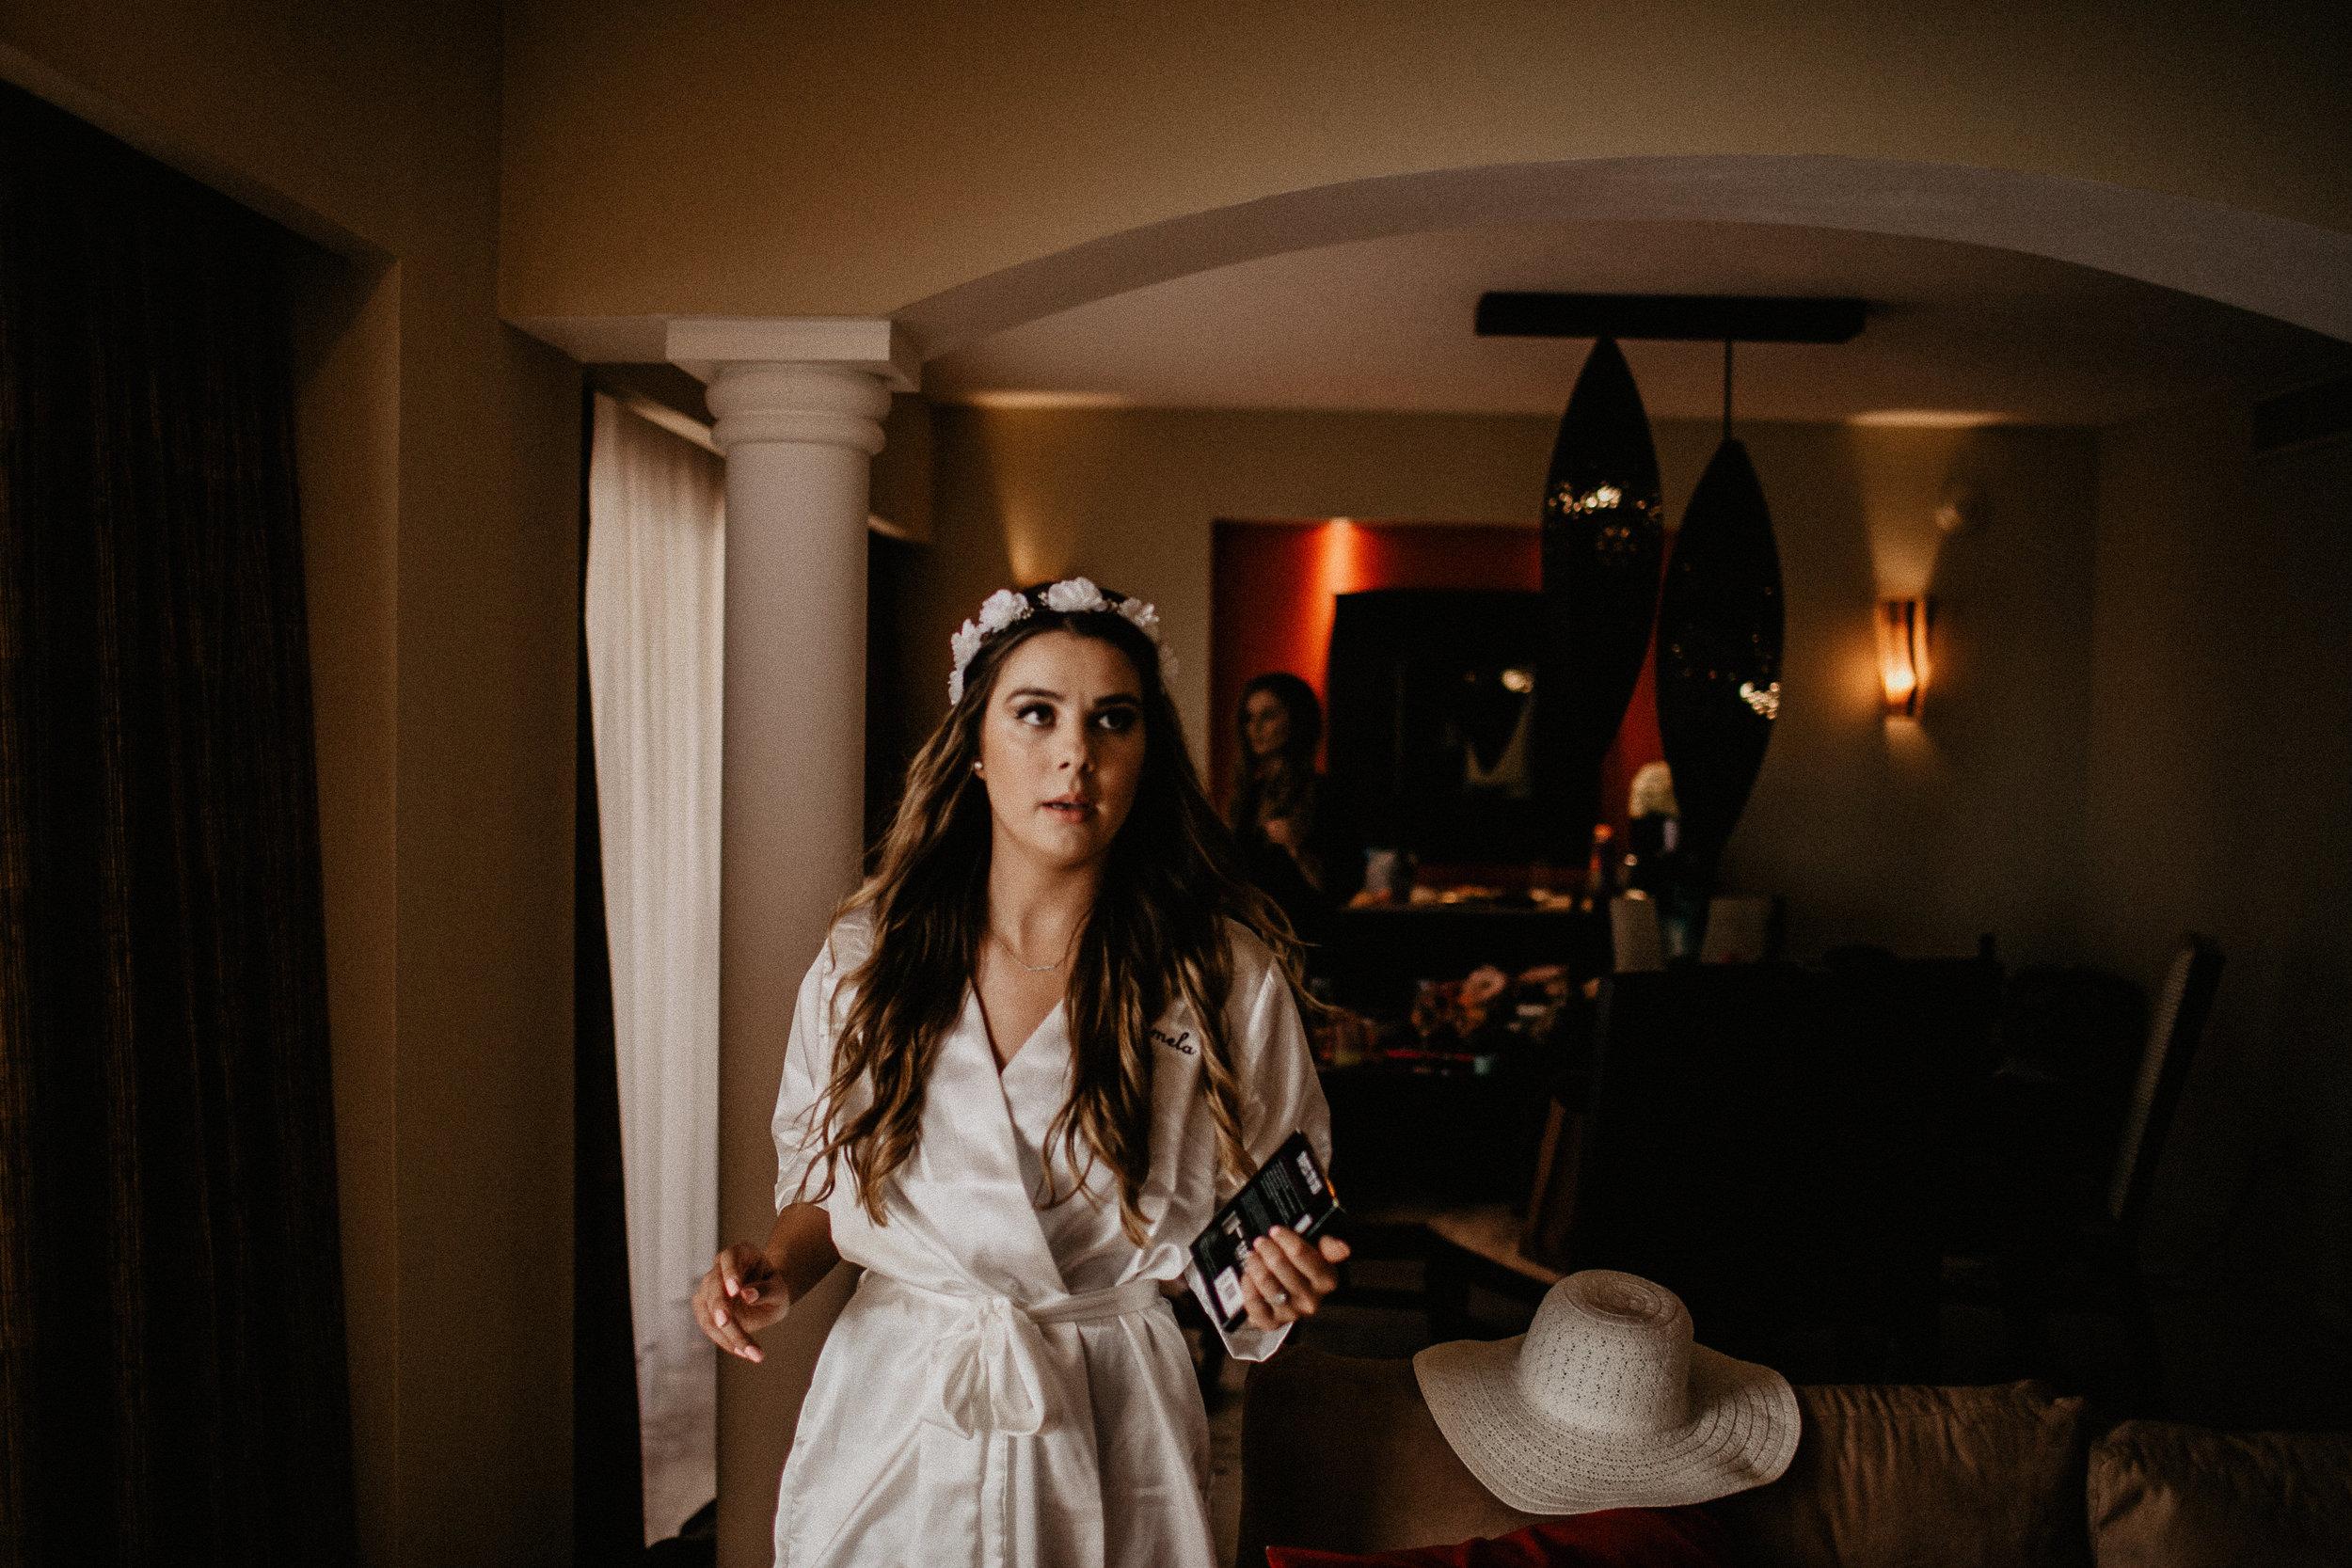 alfonso_flores_destination_wedding_photography_puerto_vallarta_hotel_barcelo_vallarta_cuttler_amela-166.JPG